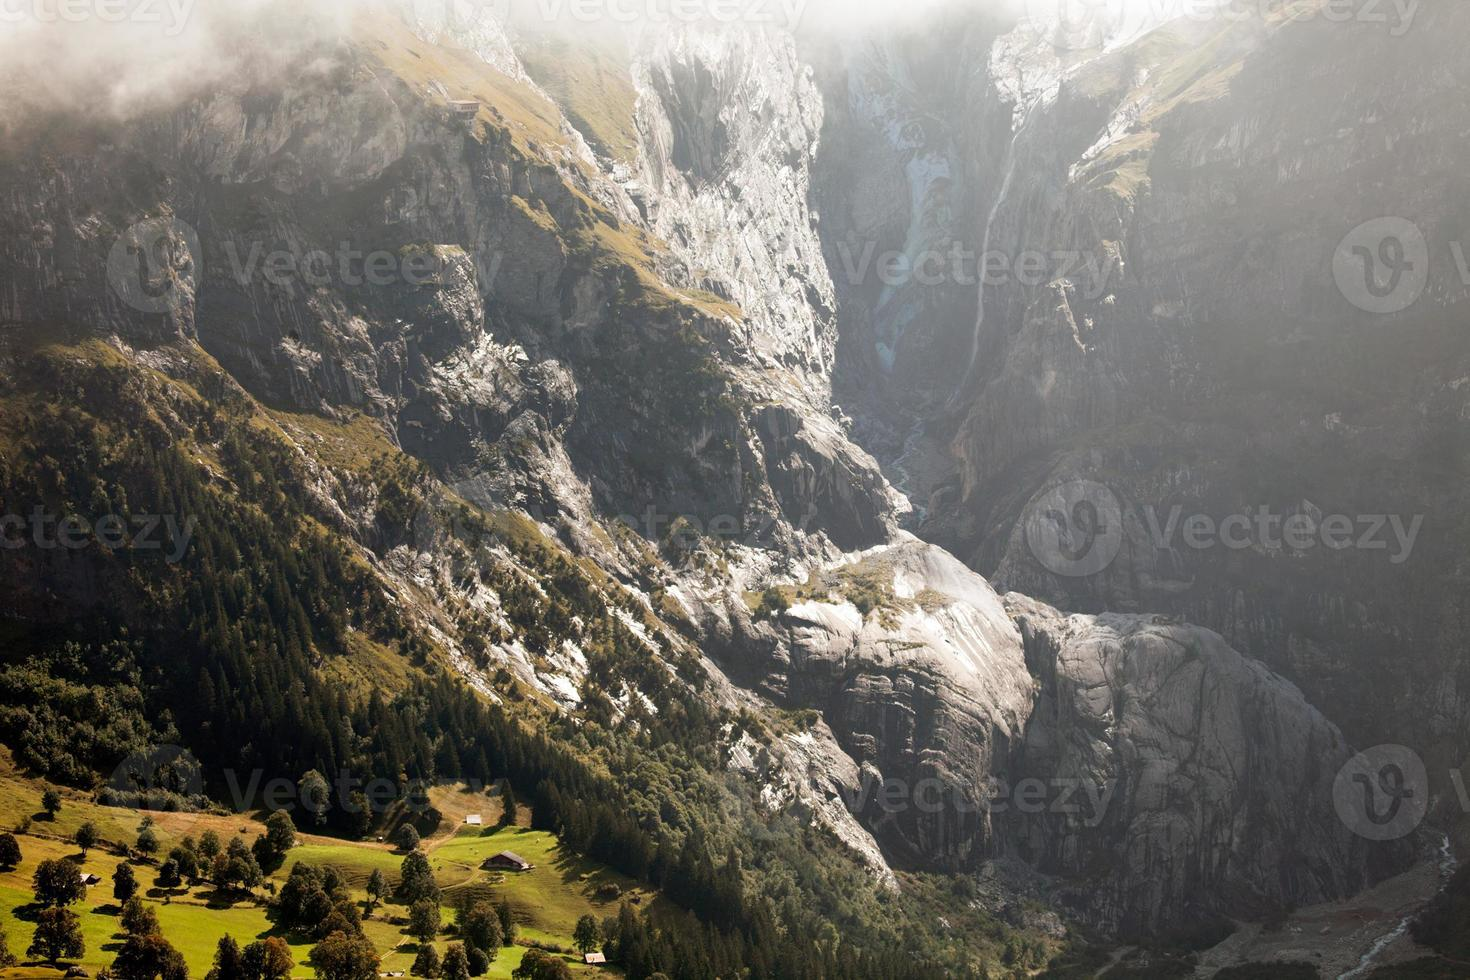 Paisajes de montaña alrededor de Grindelwald, Suiza foto